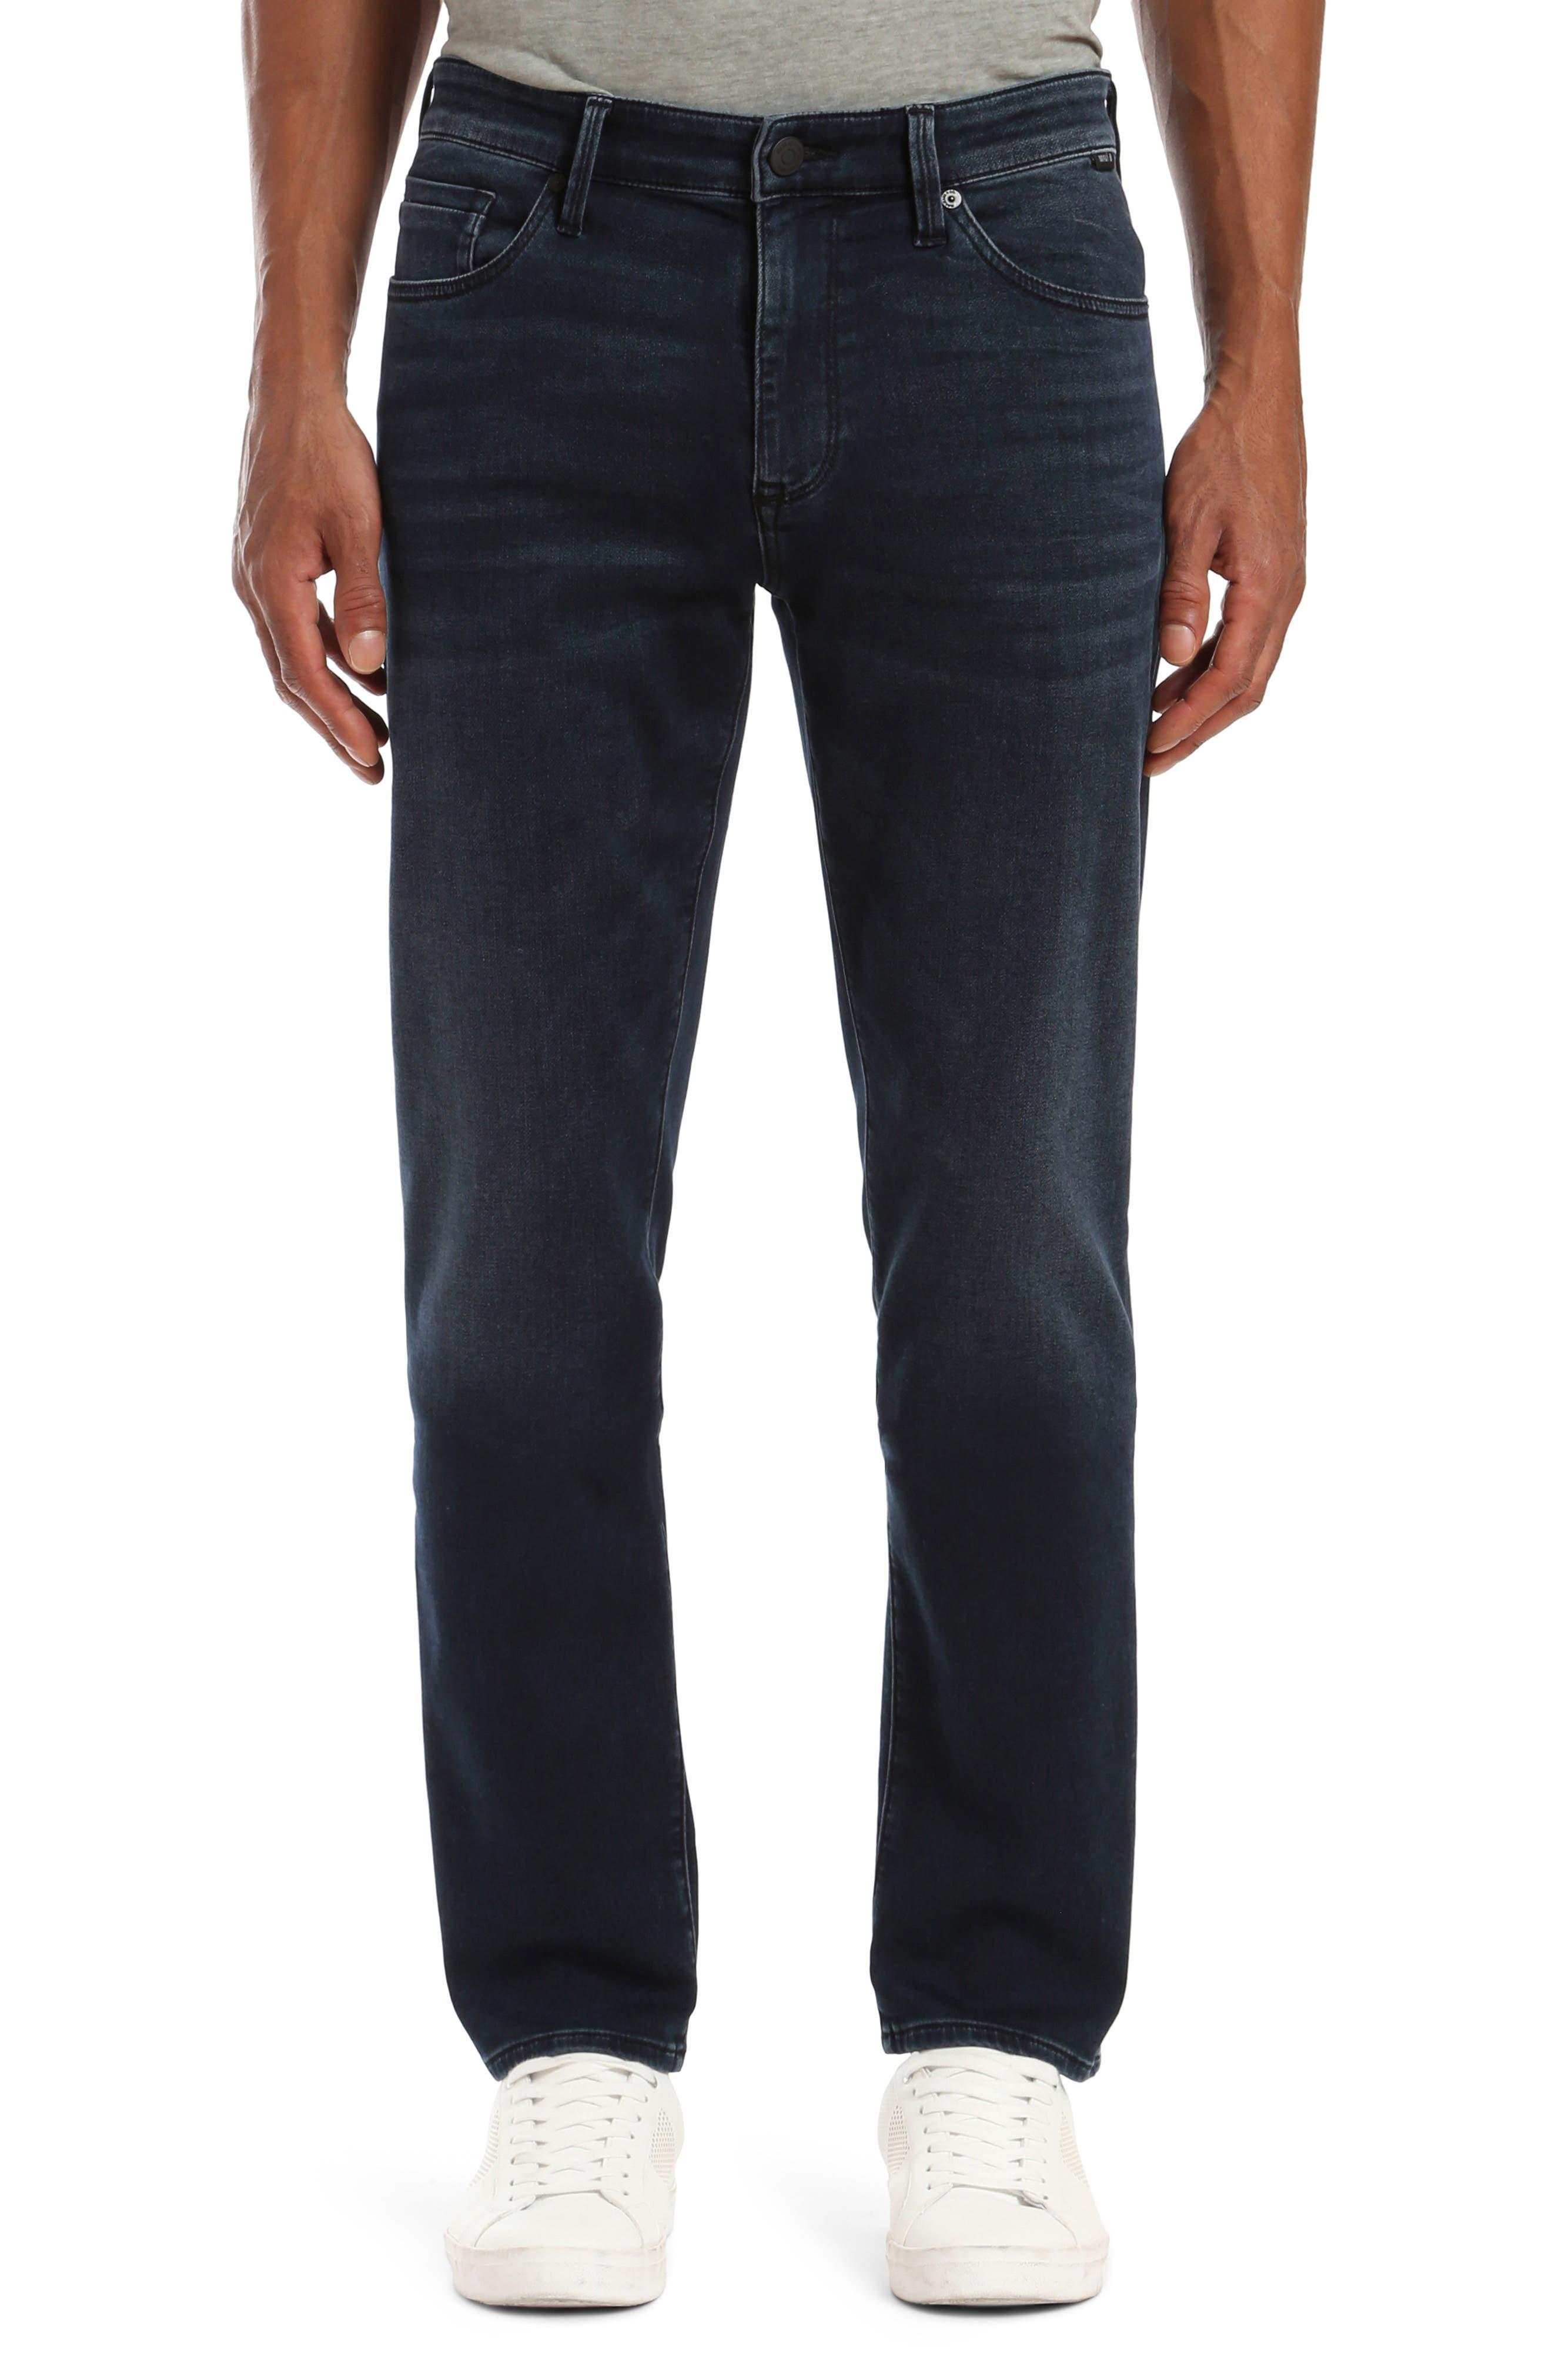 Men's Mavi Jeans Zach Straight Fit Jeans,  32 x 34 - Blue